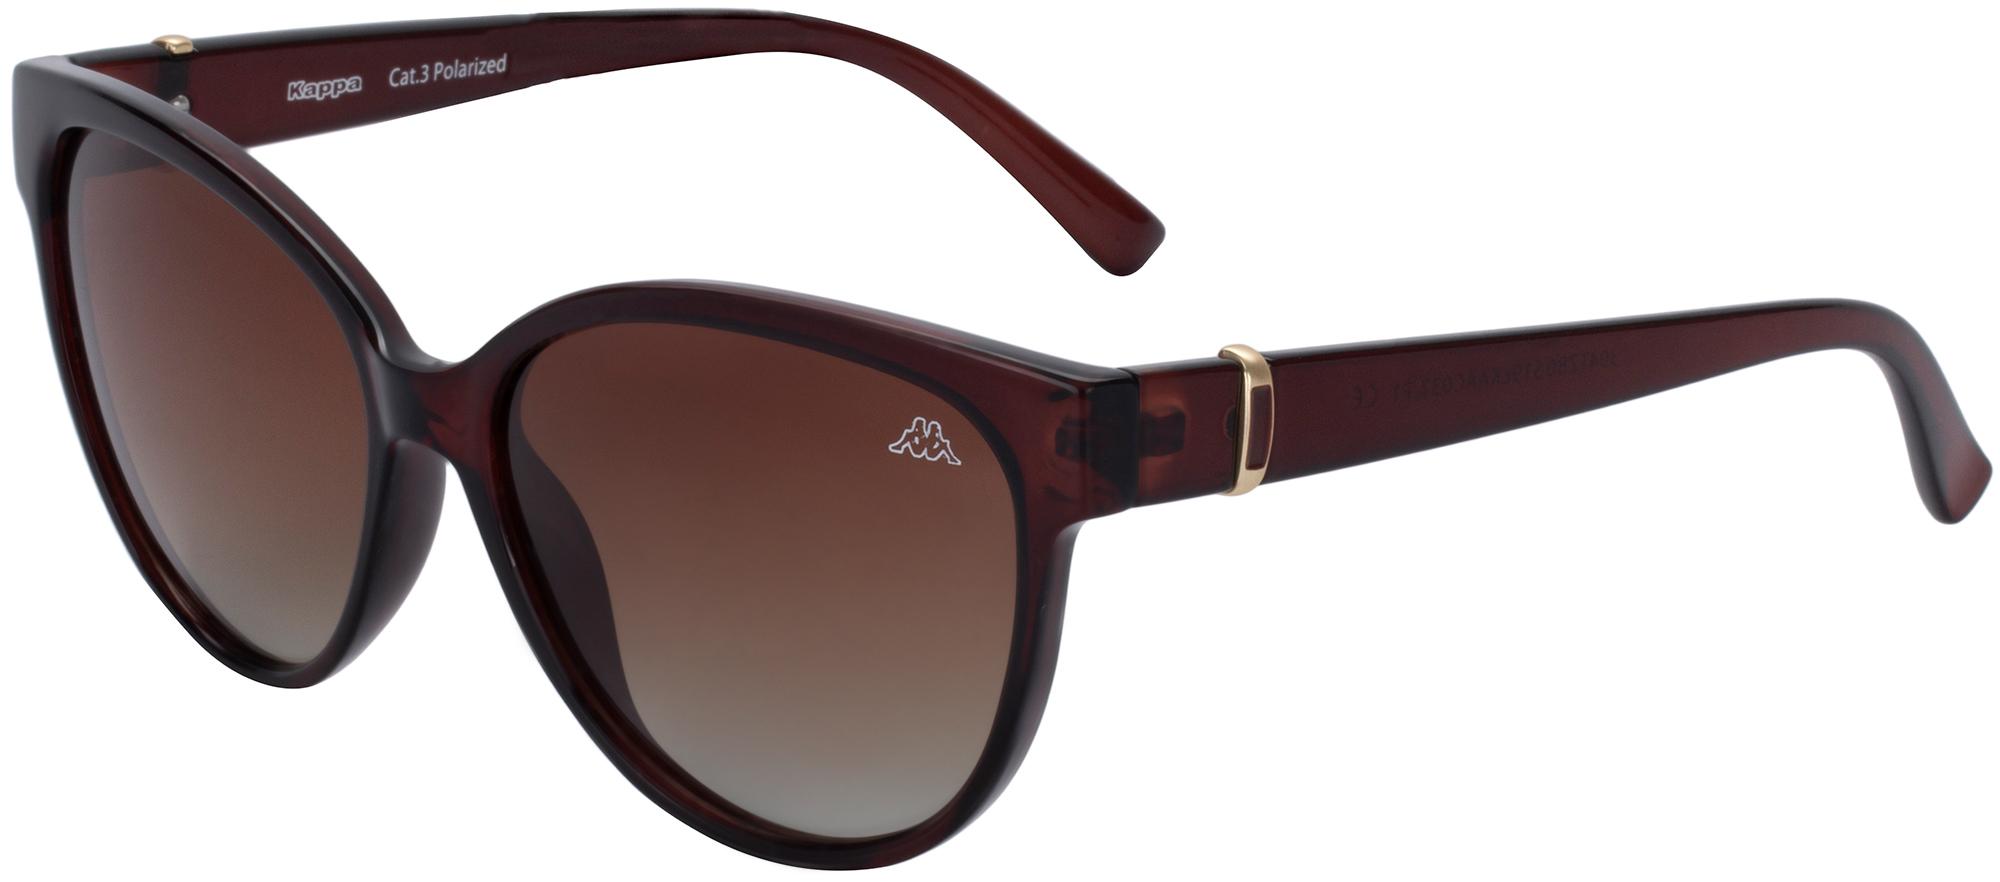 Kappa Солнцезащитные очки Kappa kappa kappa kp 1419m b